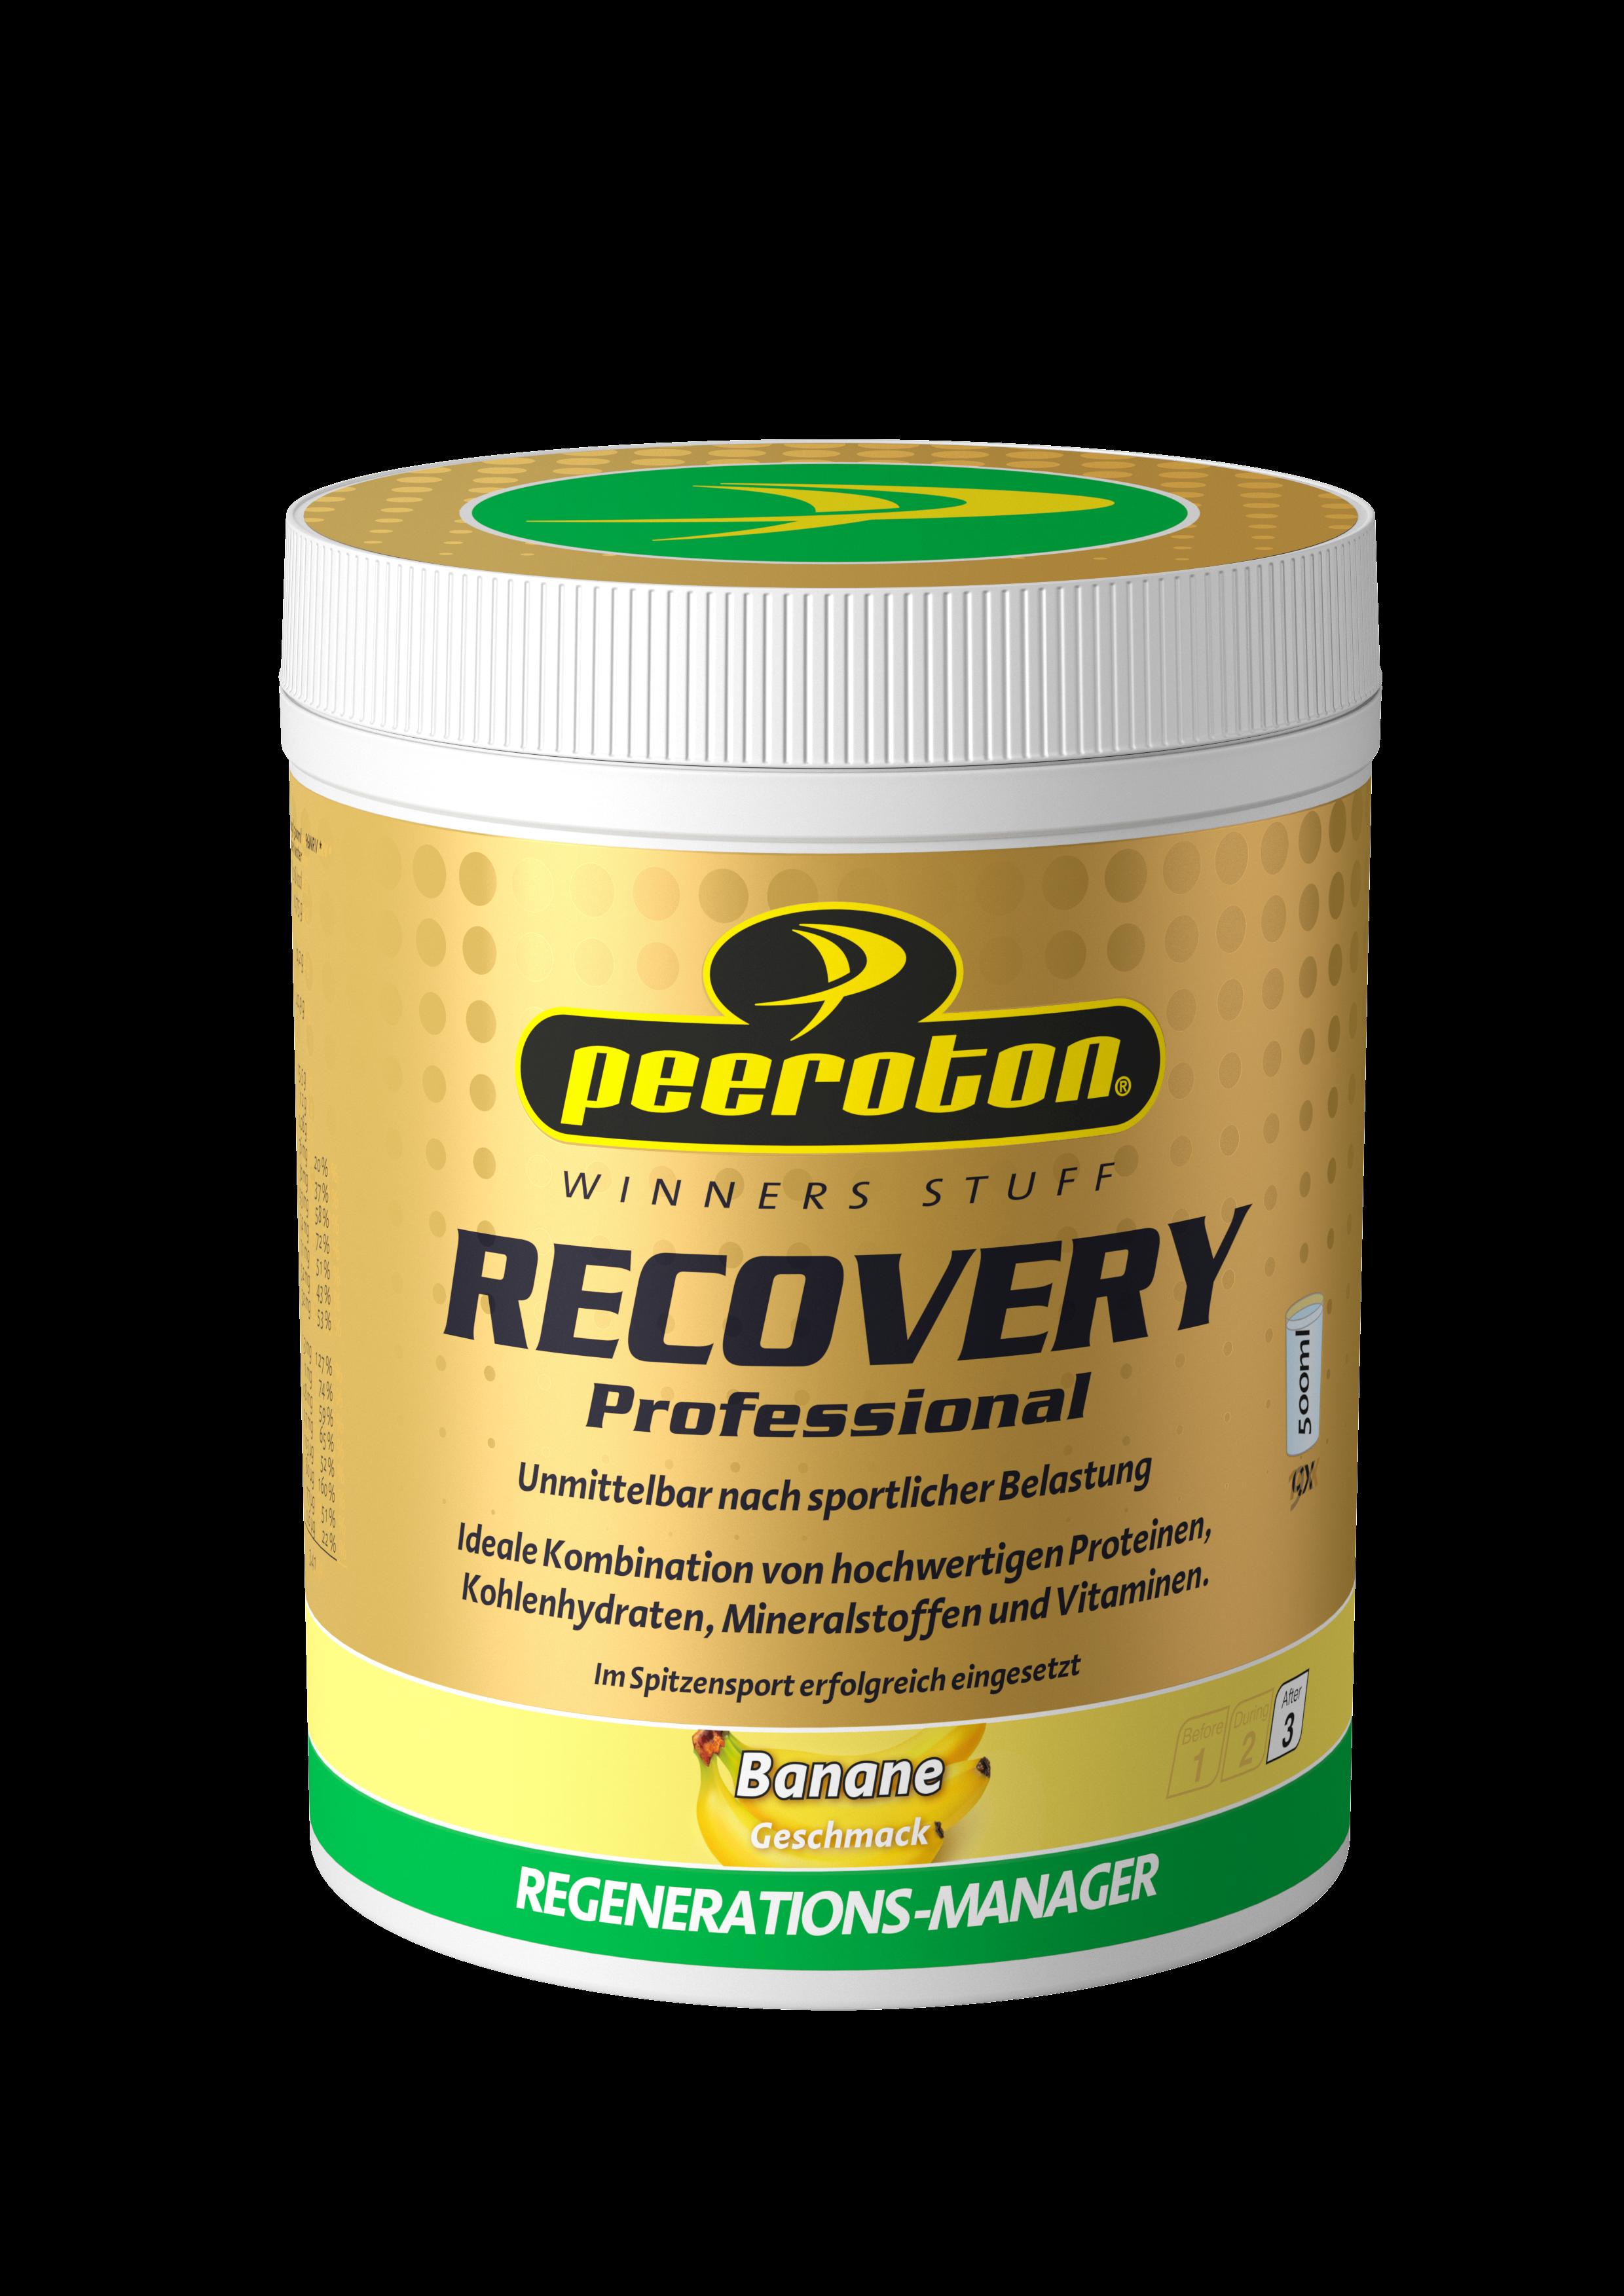 Peeroton Recovery Professional 540g BANANE